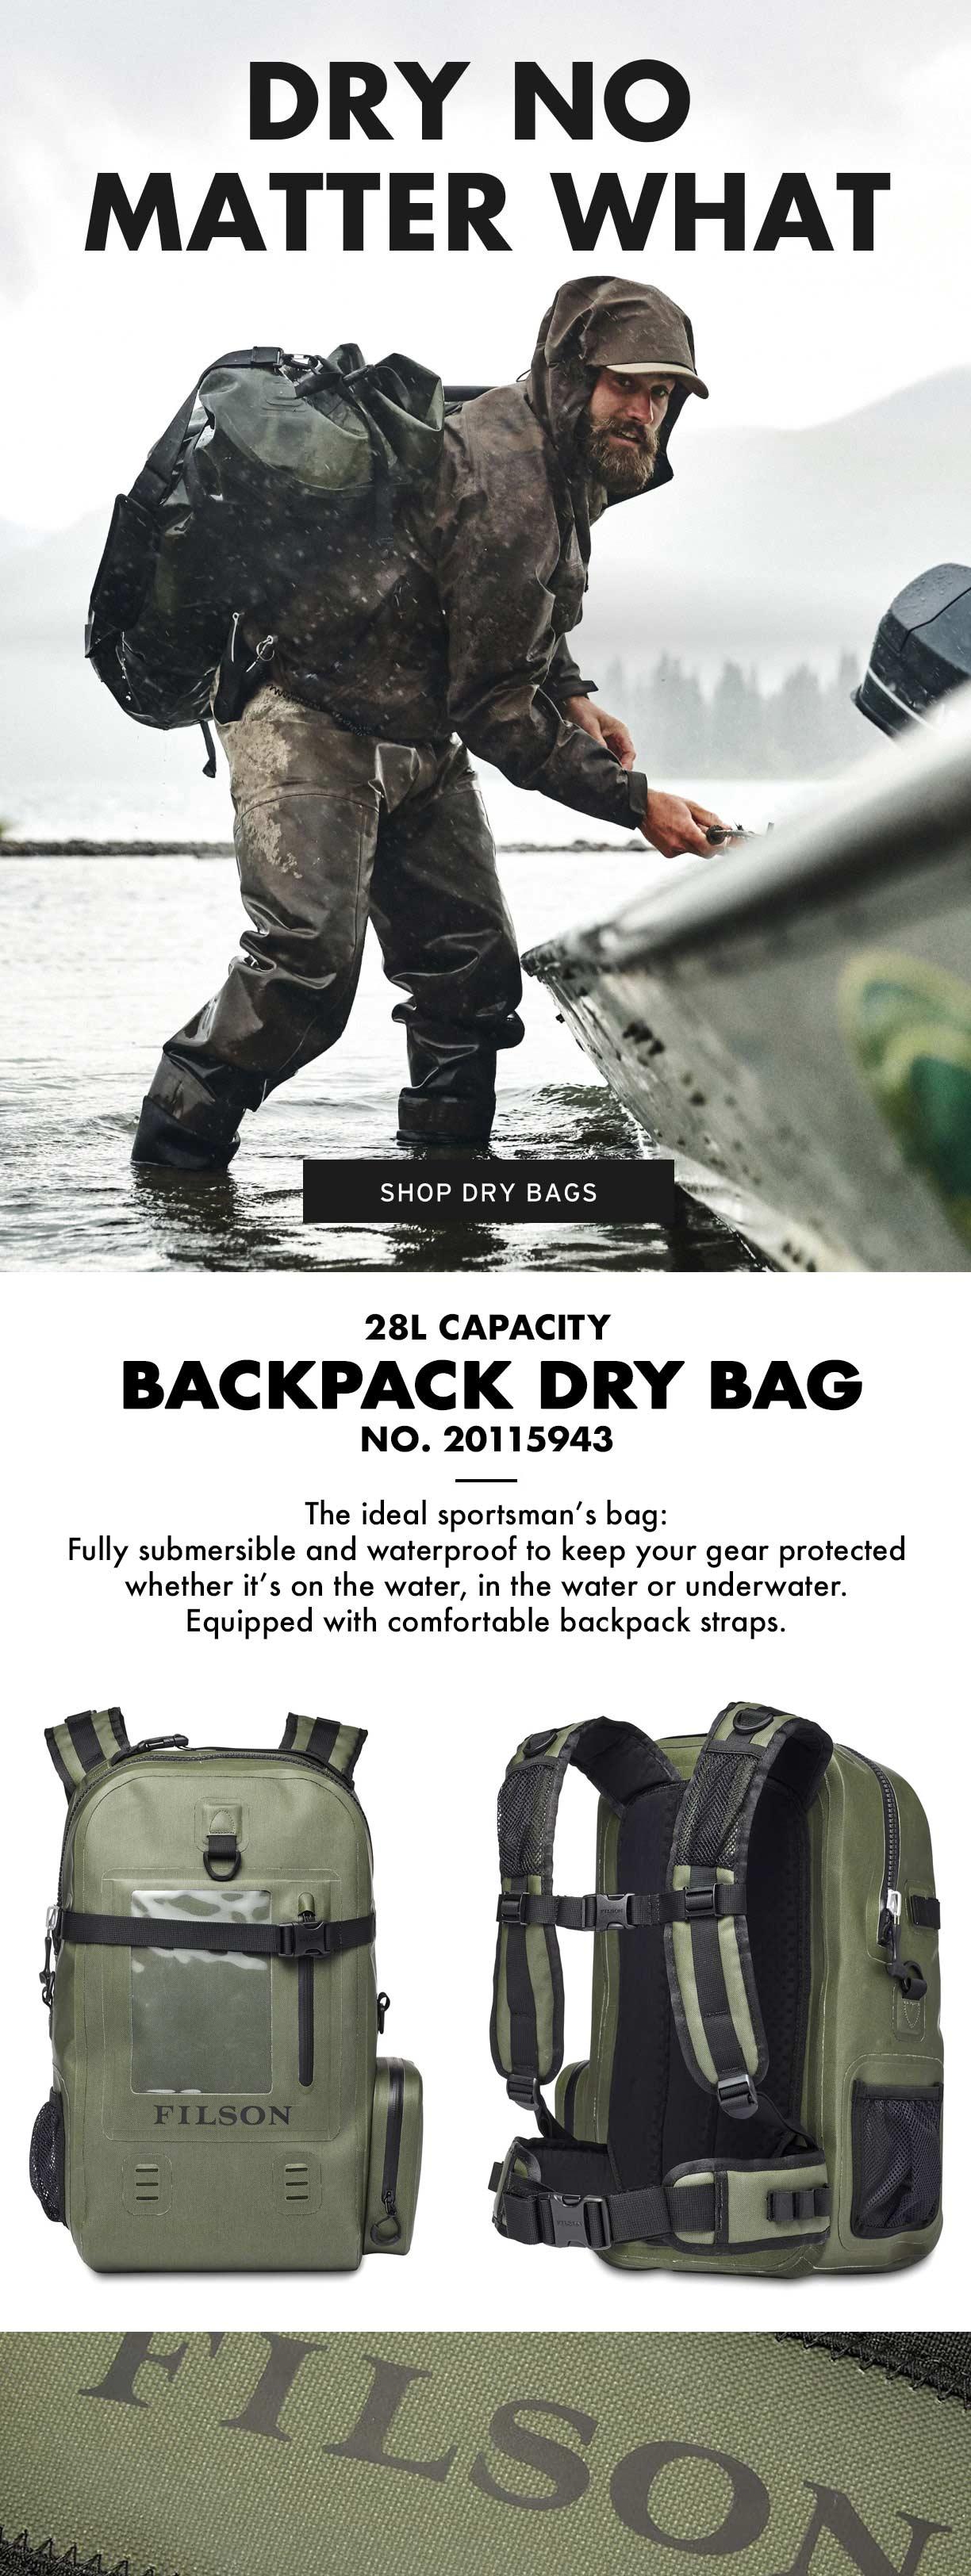 Filson Backpack Dry Bag Productinformation